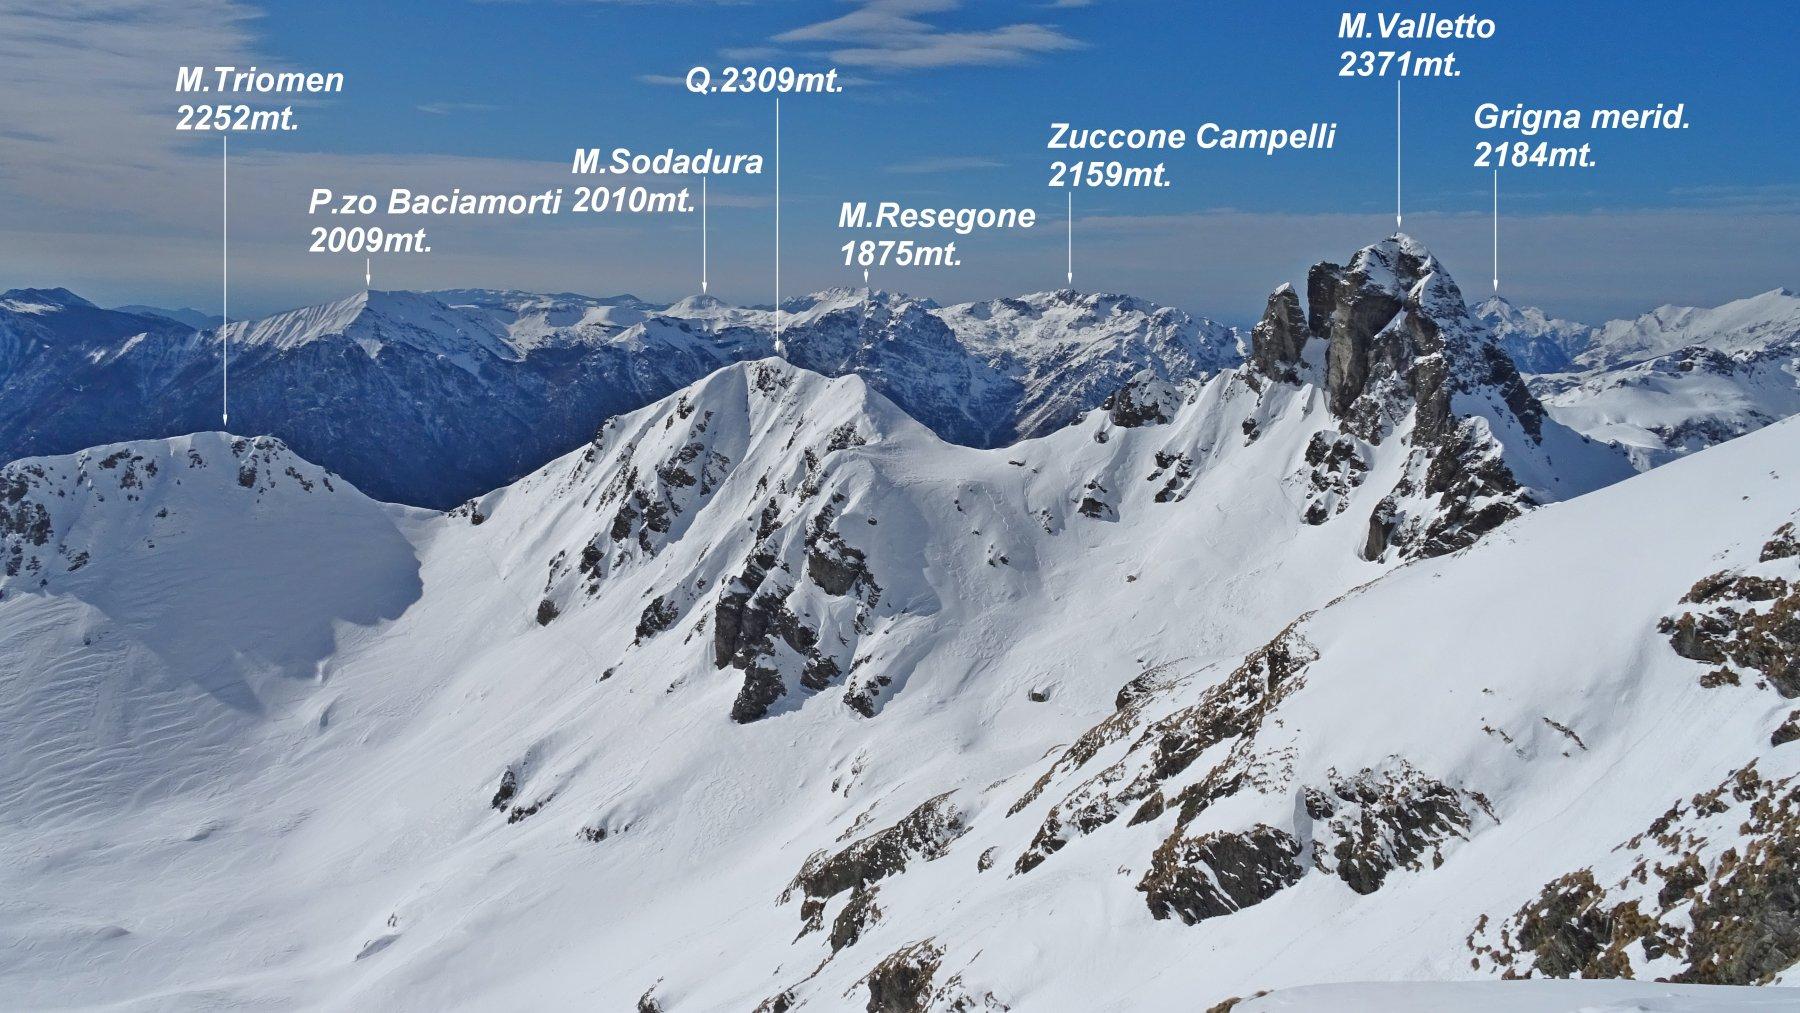 Panorama da quota 2353mt. del M.Ponteranica centrale.